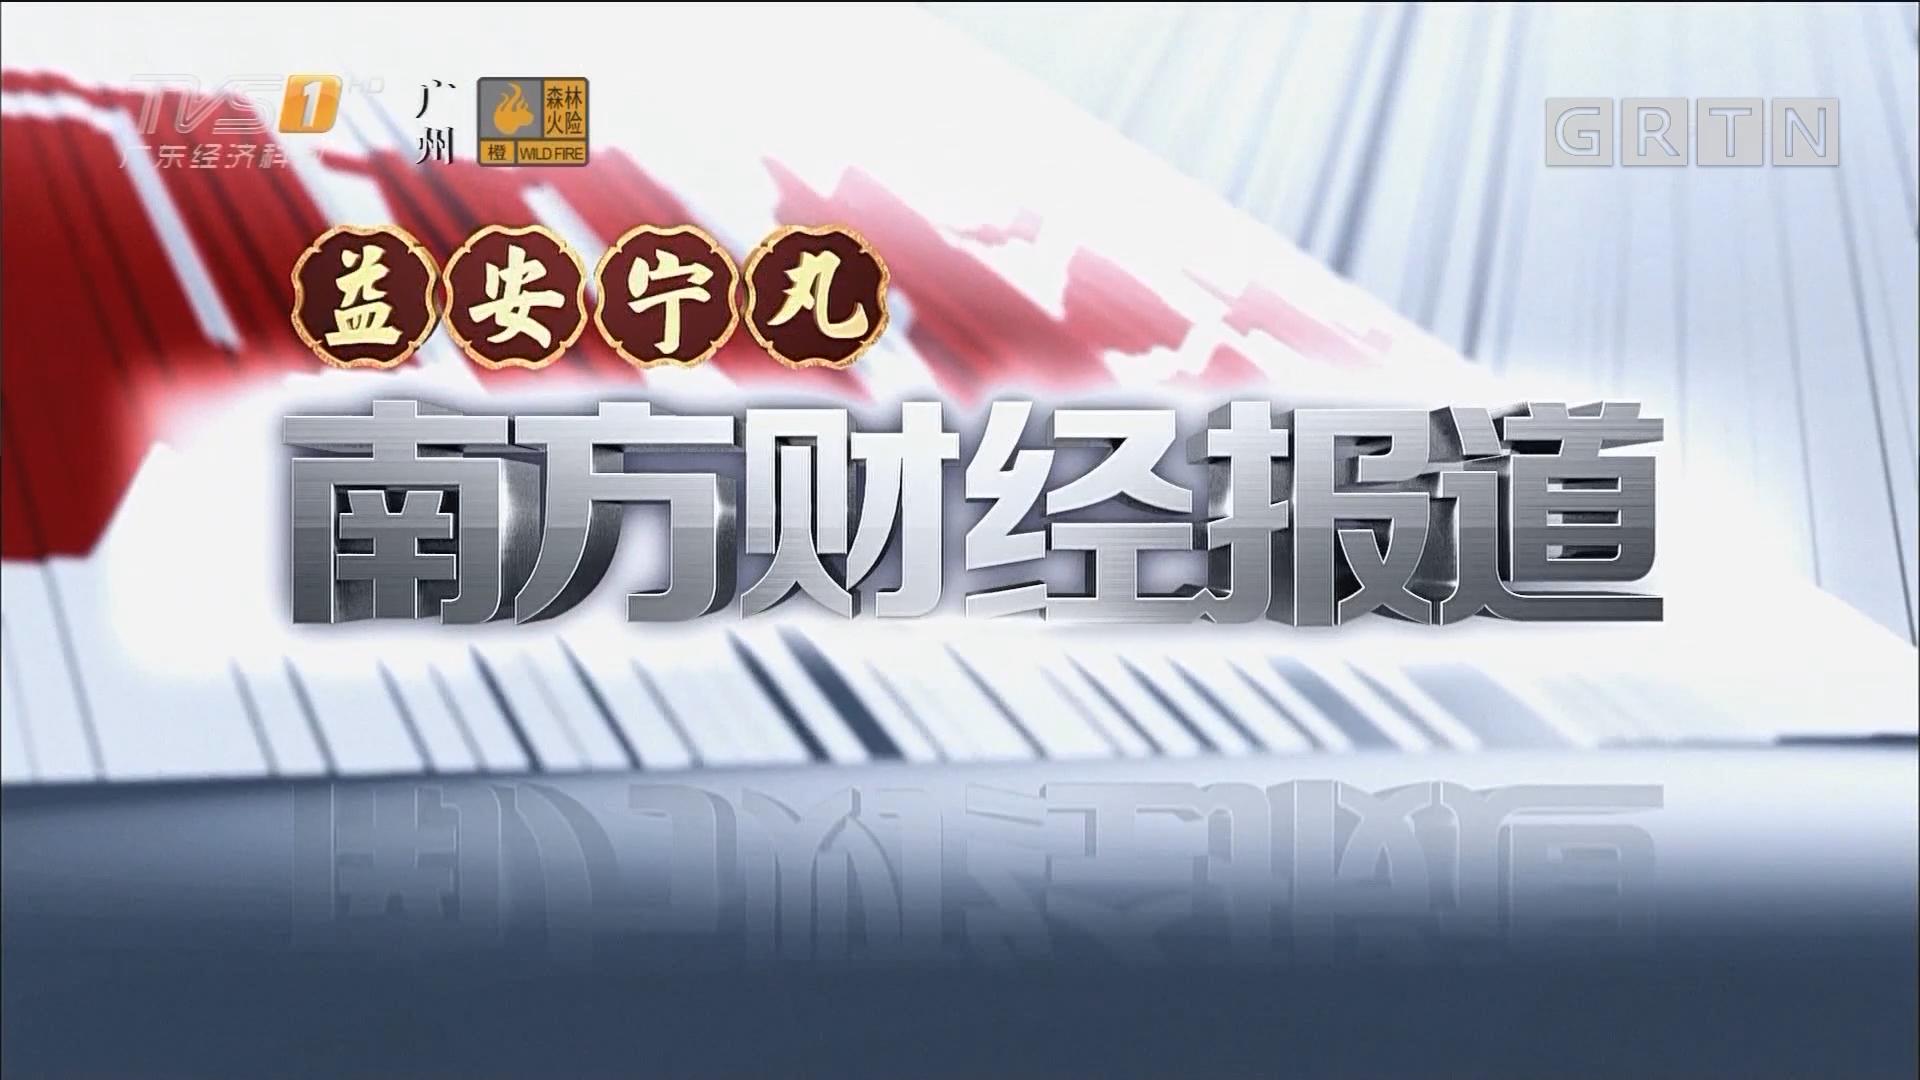 [HD][2019-02-10]南方财经报道:广东省科学技术厅:绽放科技的力量